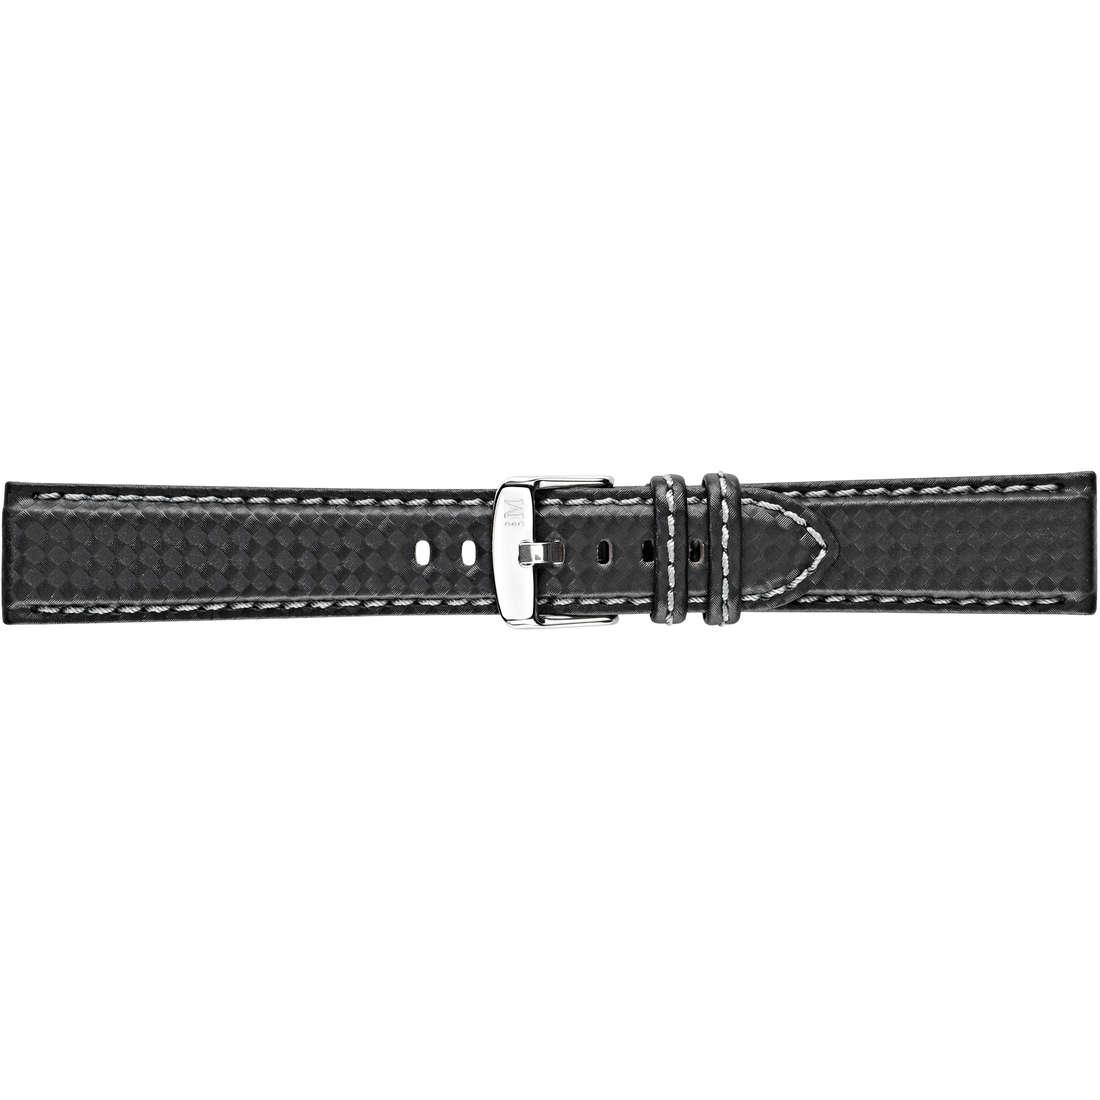 watch watch bands watch straps man Morellato Linea Sport A01U3586977891CR24